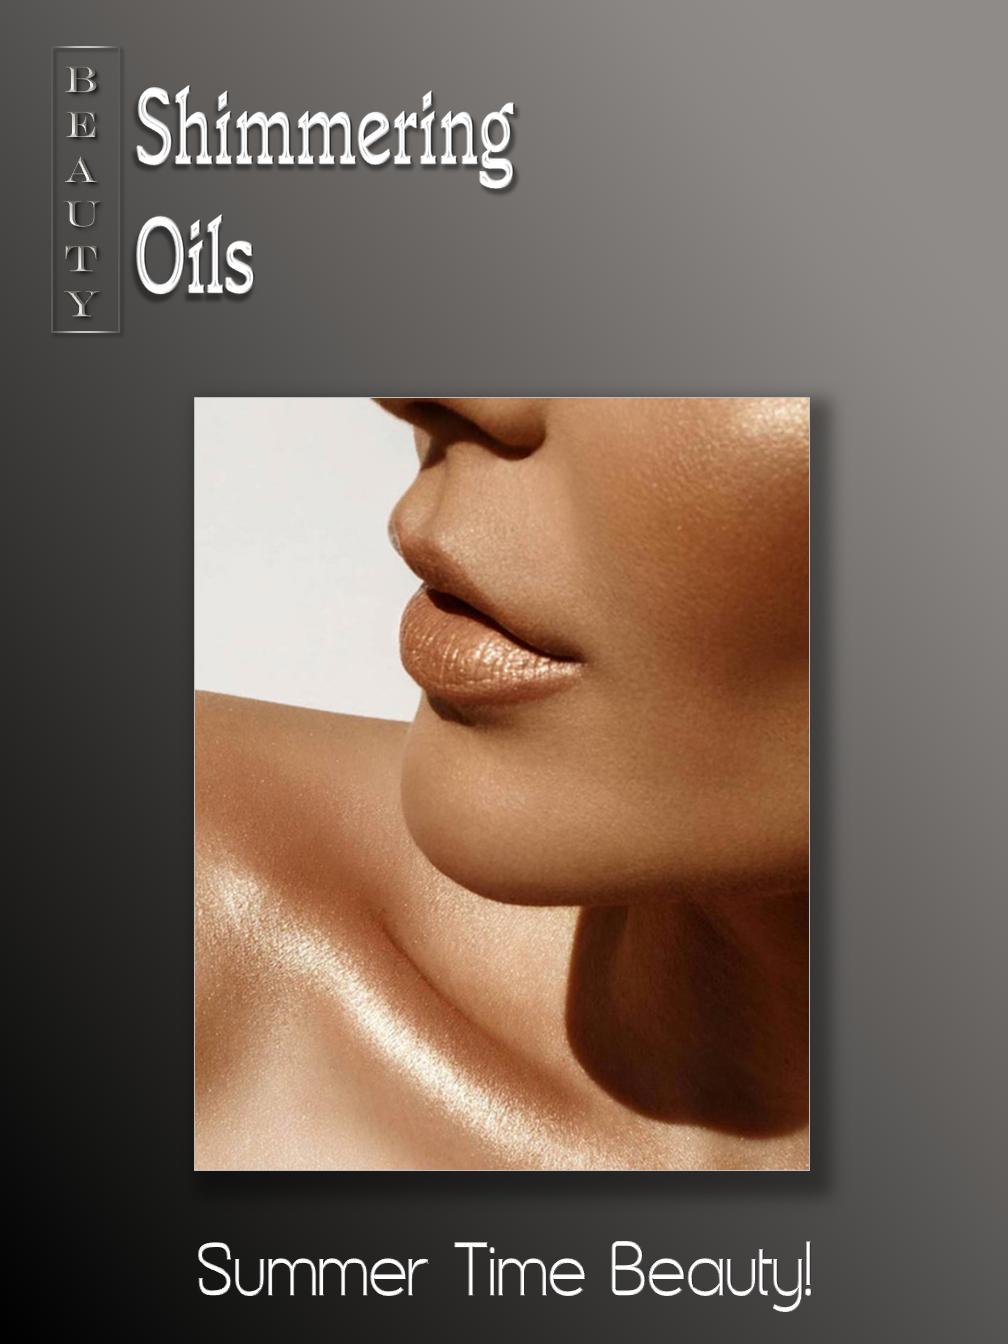 Shimmering Oils